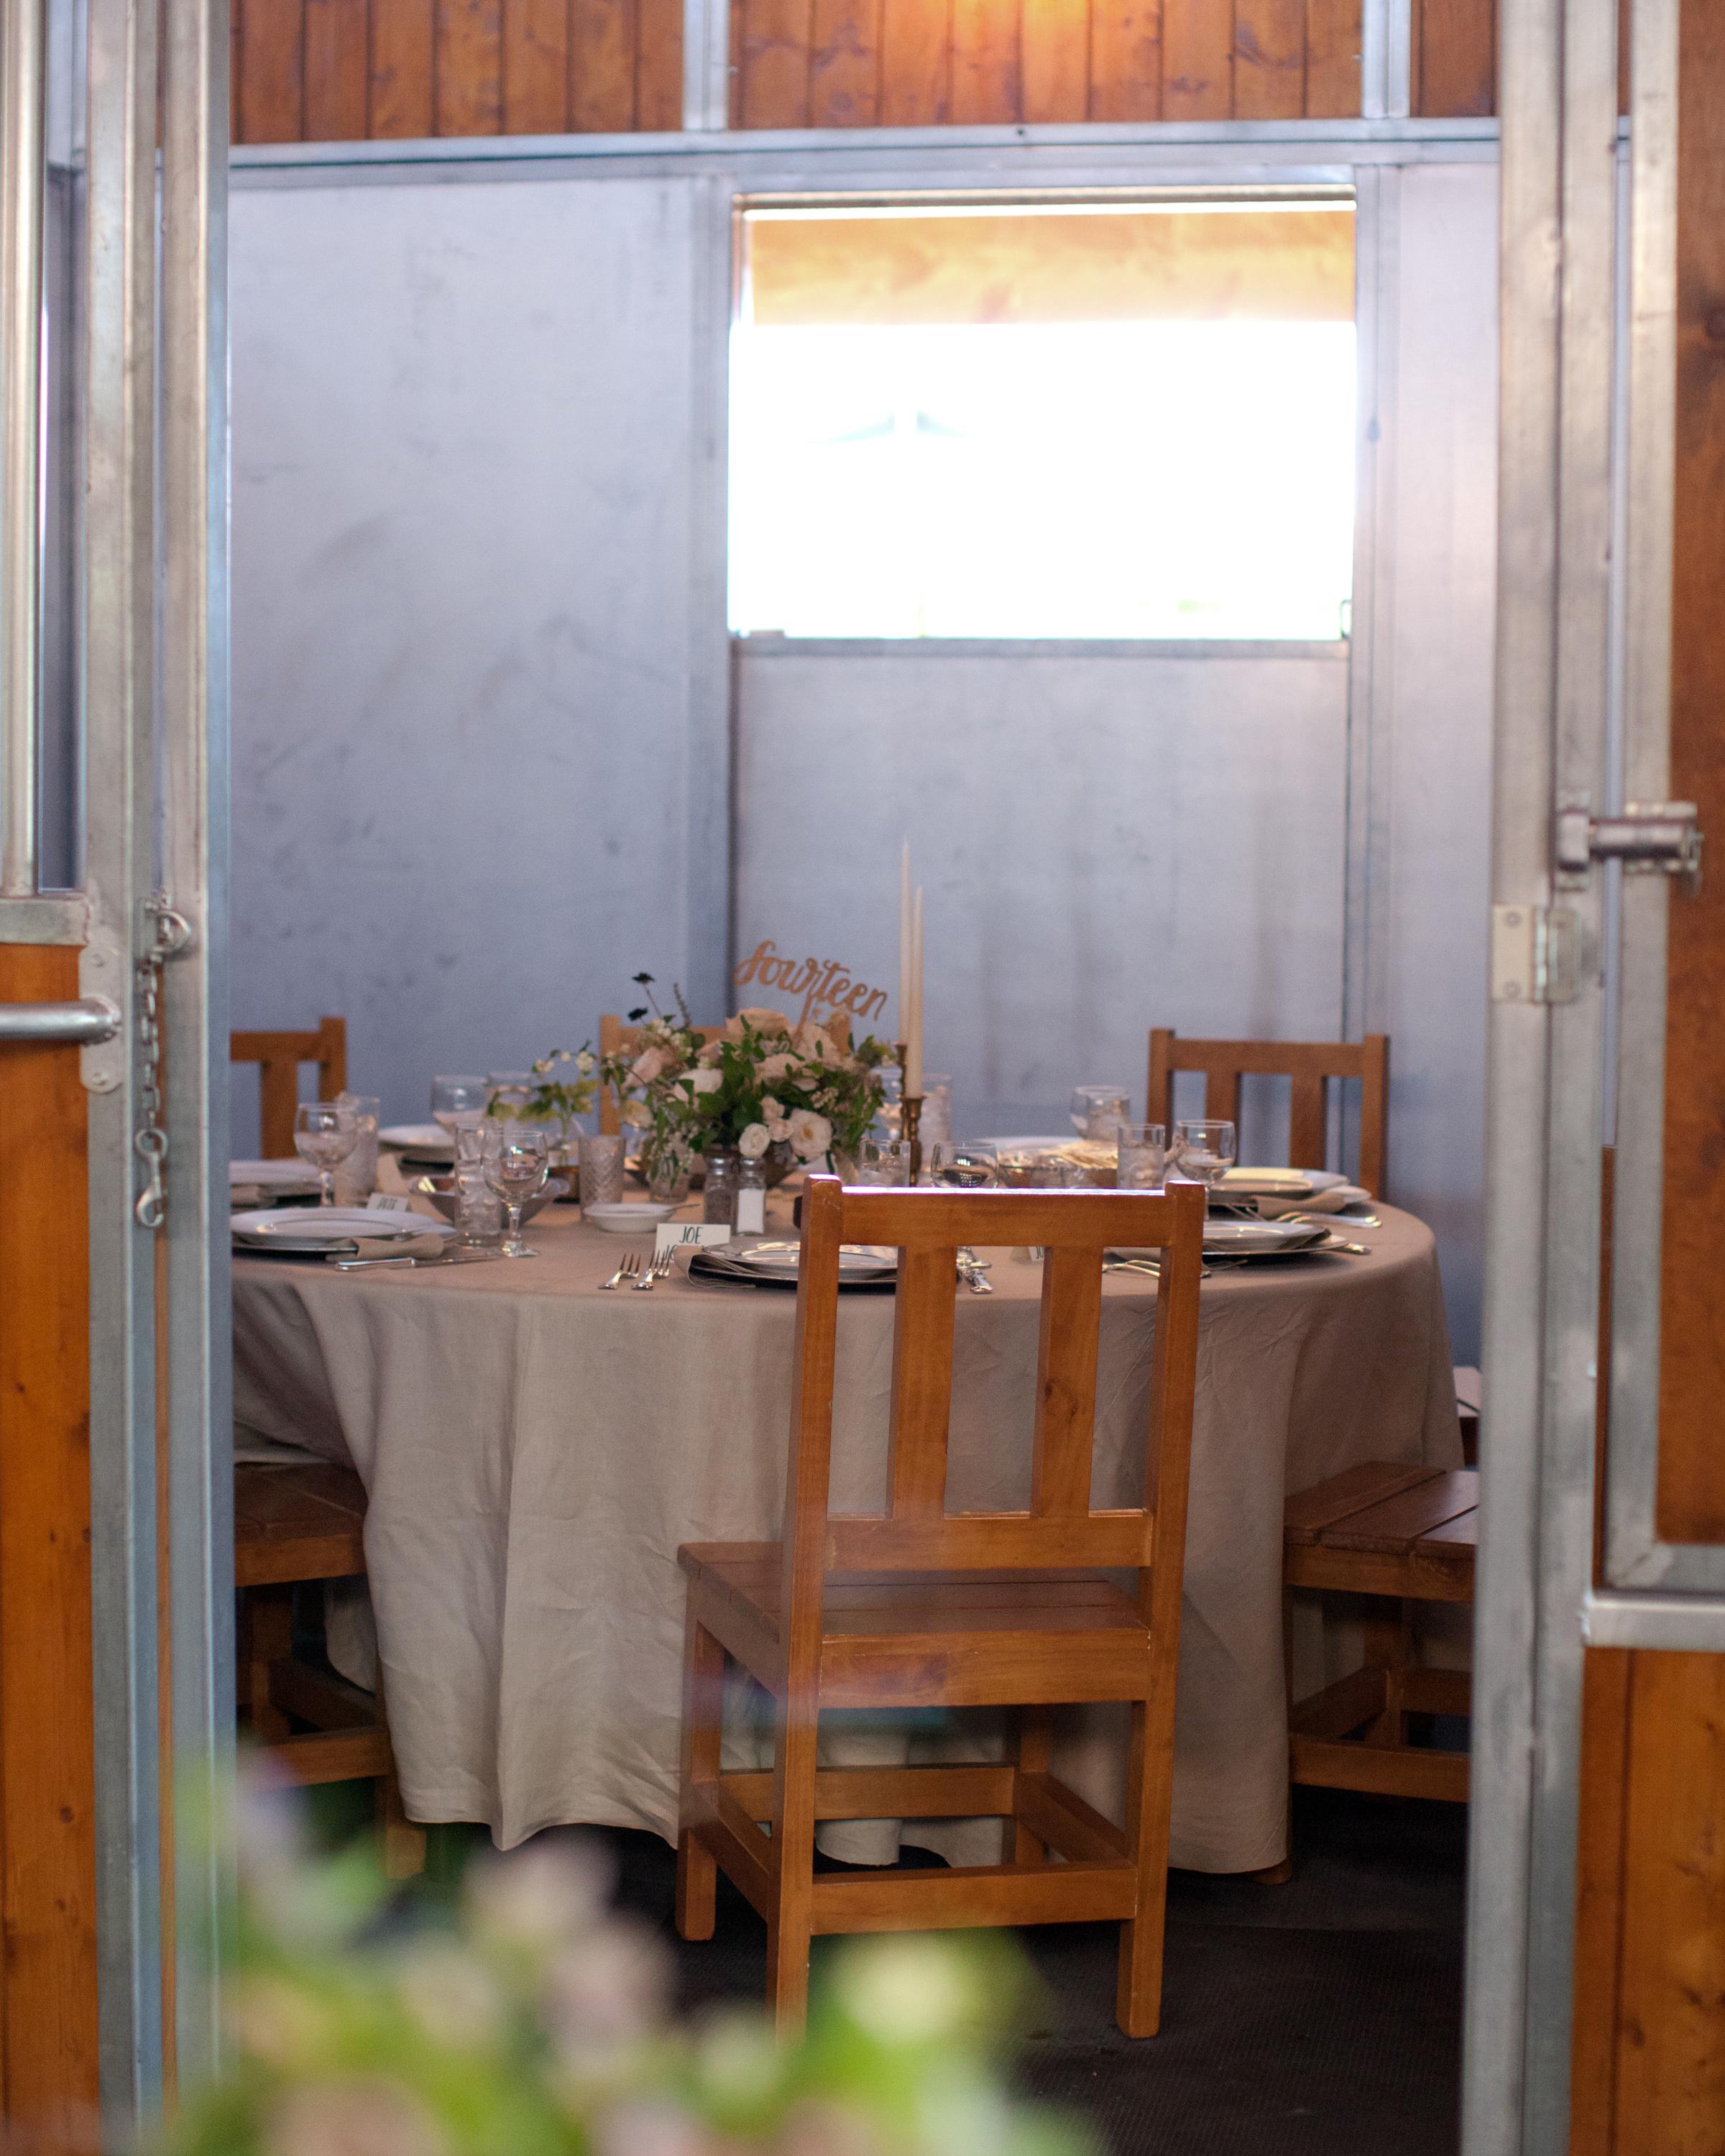 lizzy-pat-wedding-roundtable-152-s111777-0115.jpg